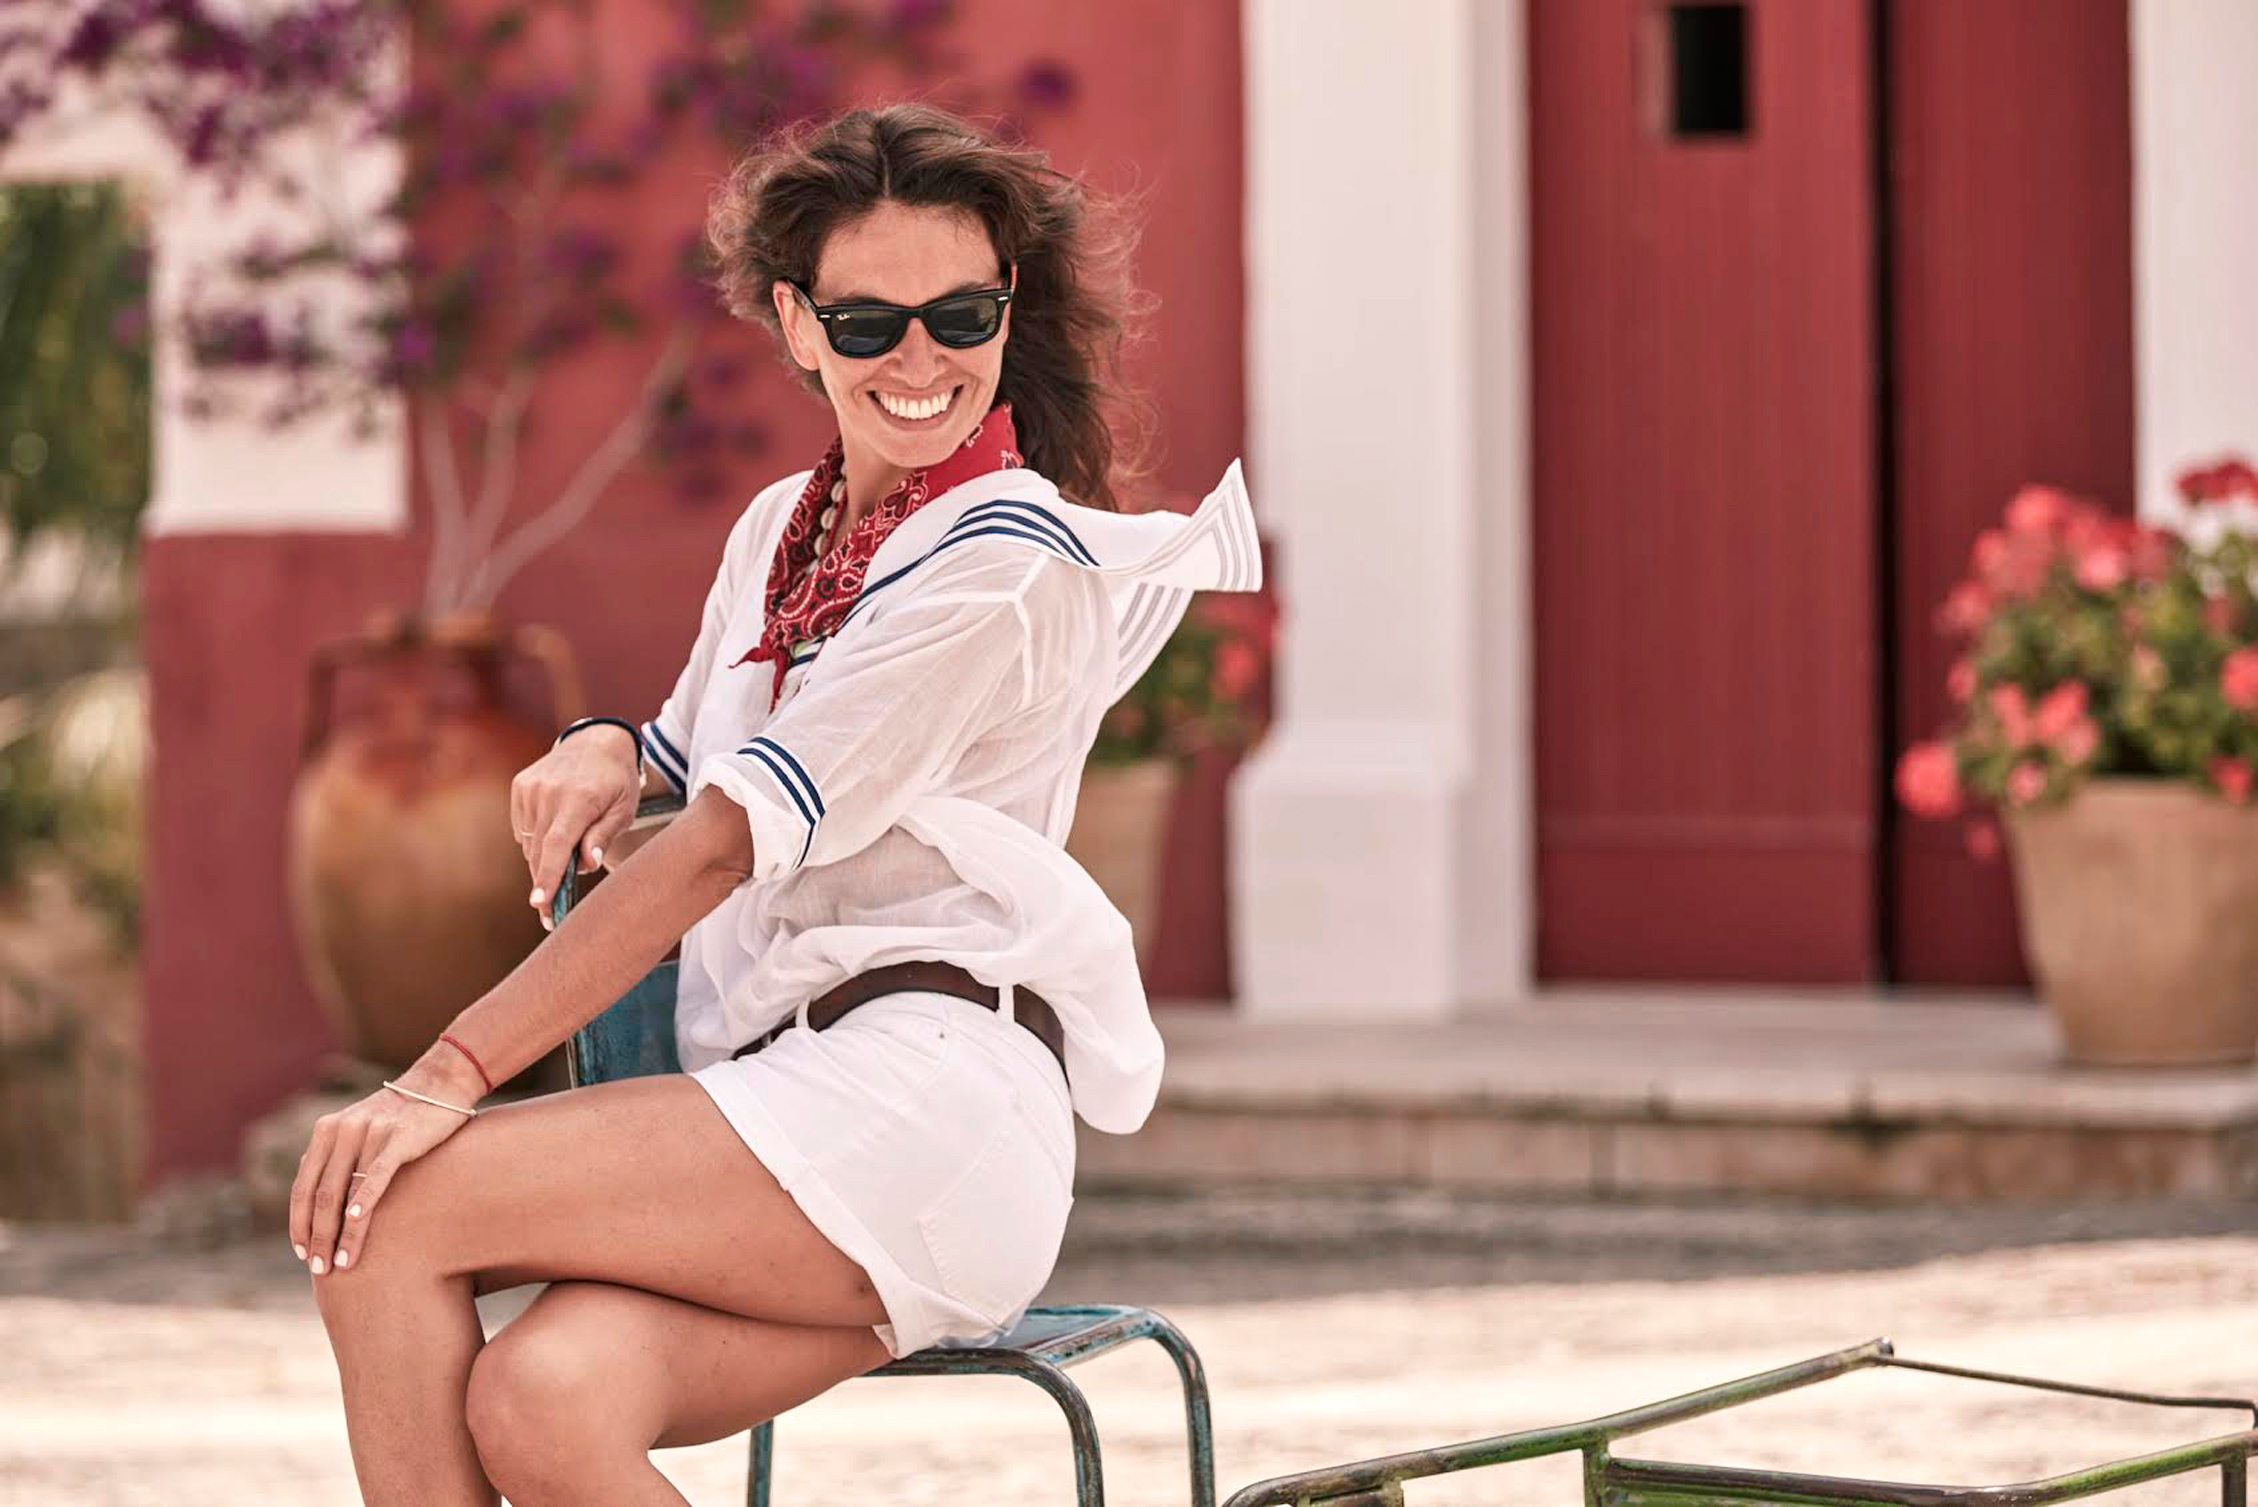 Jet setting with Viviana Volpicella